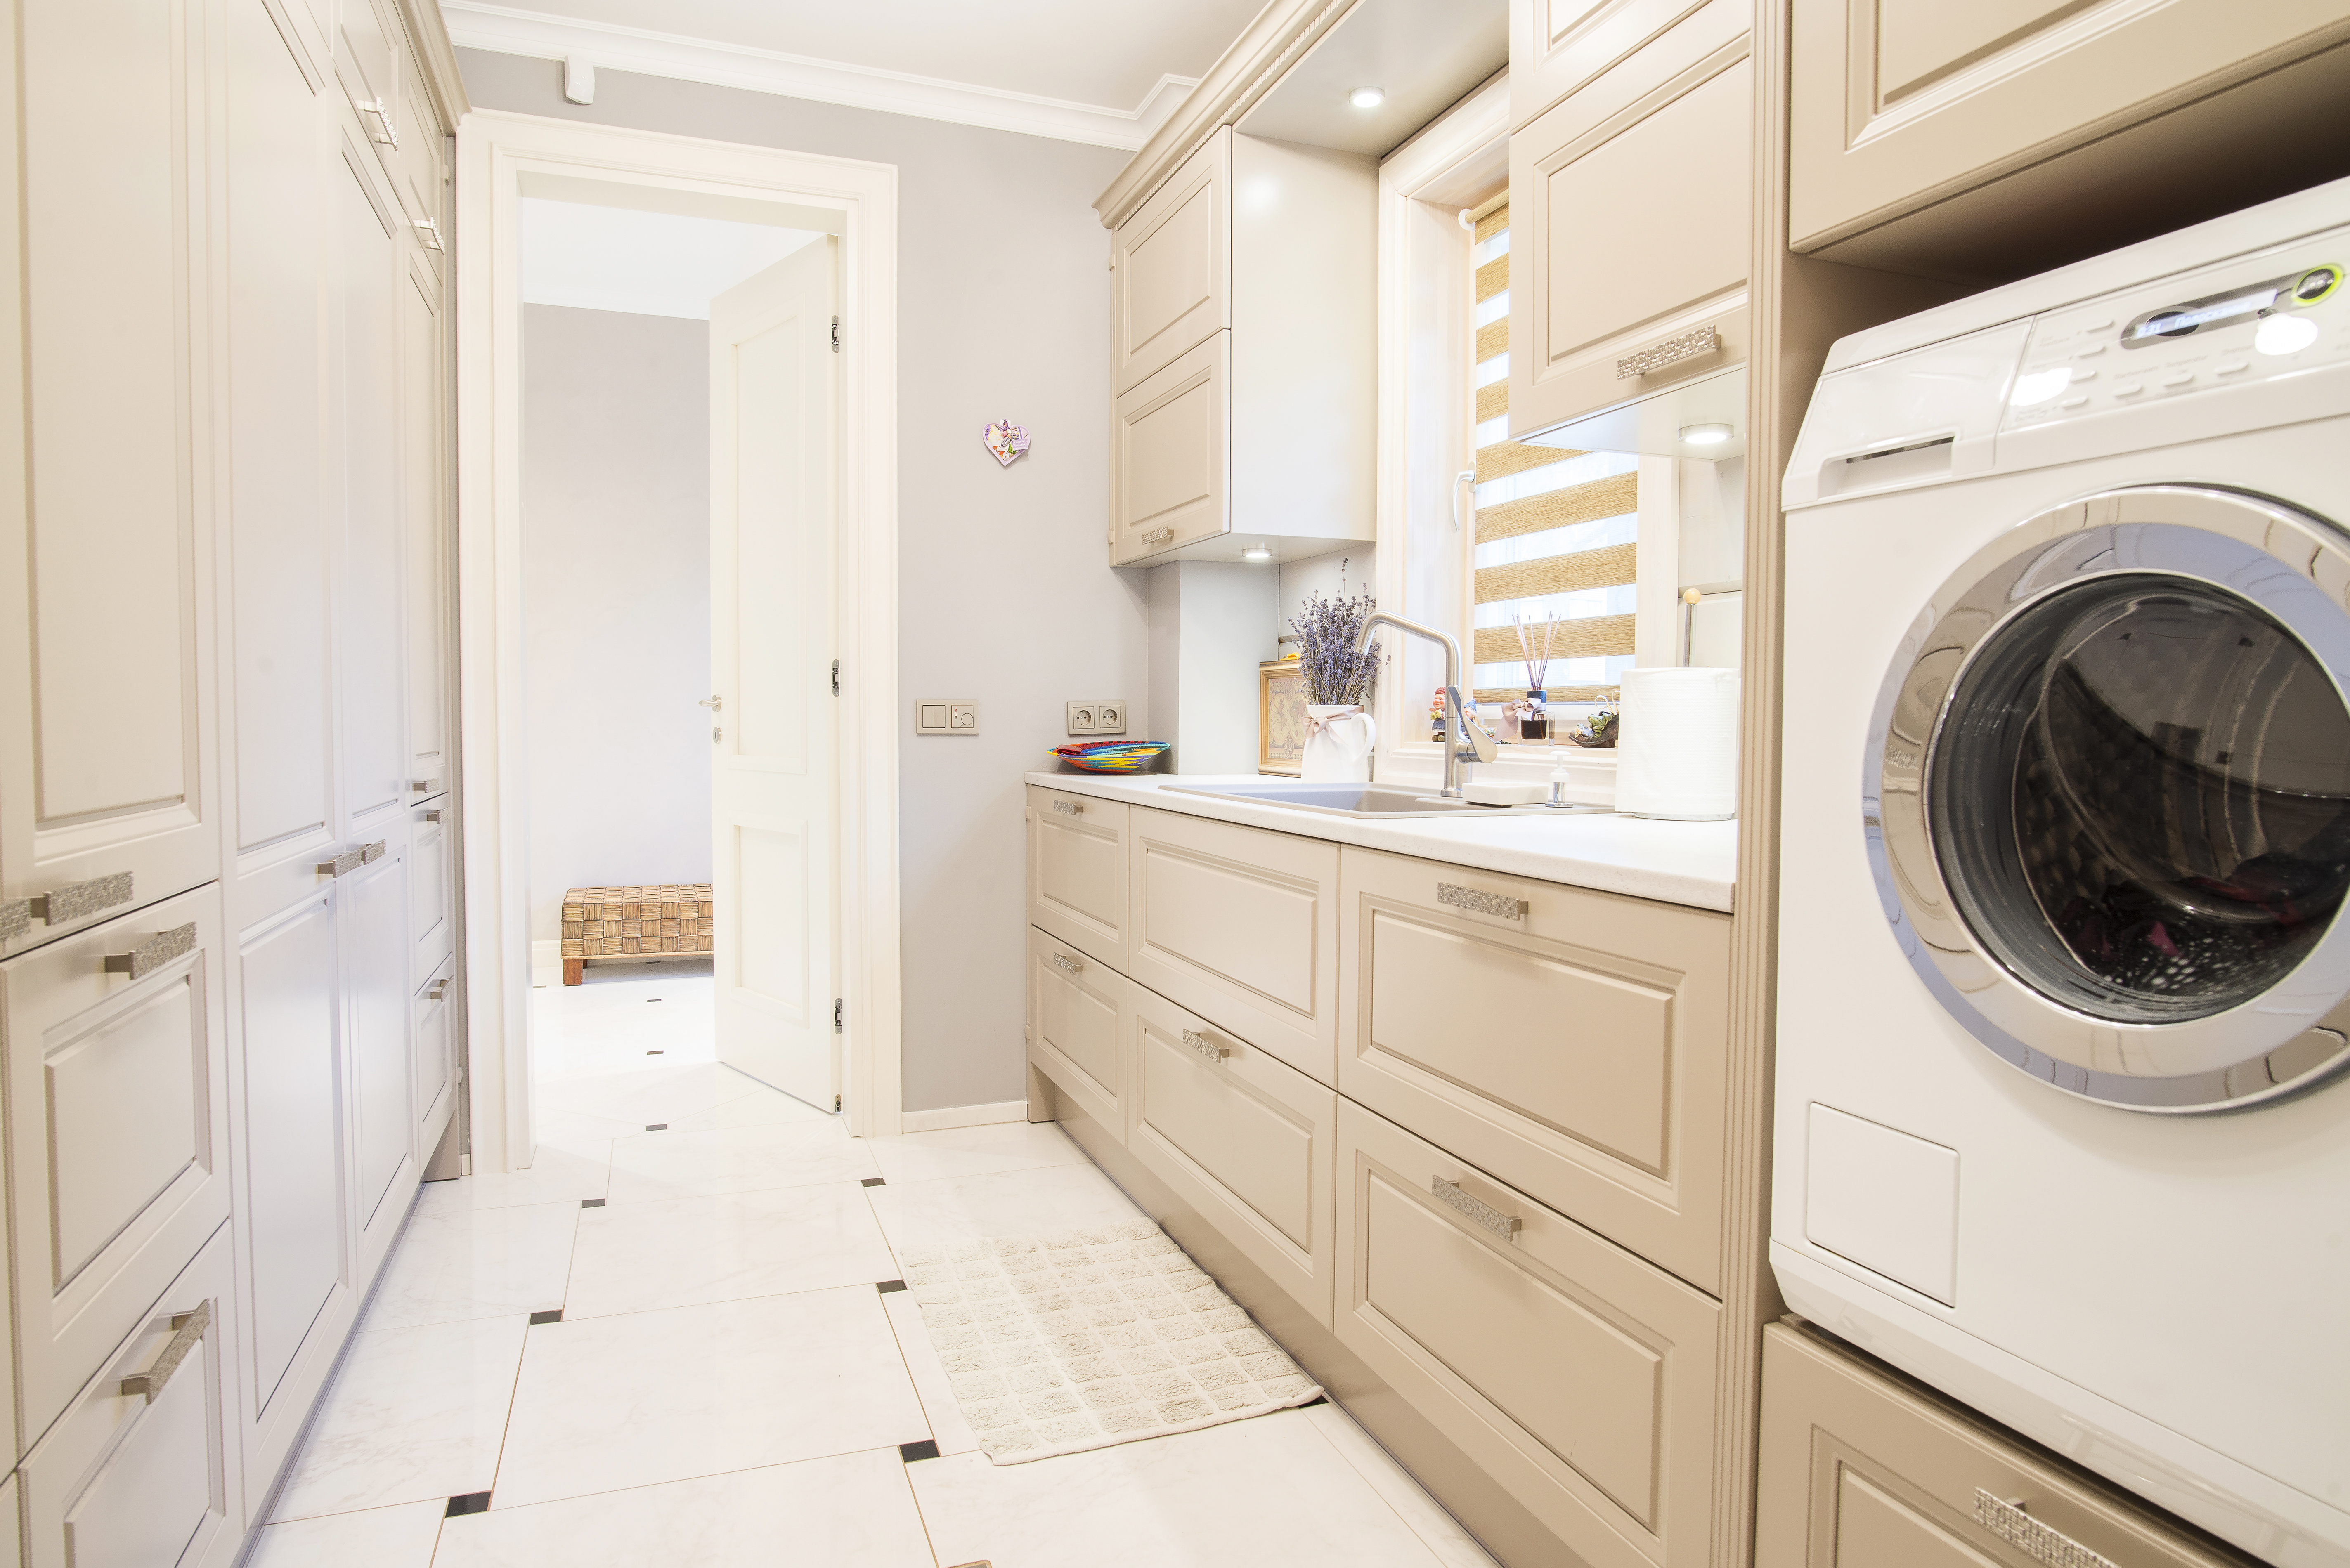 Modern log wood house laundry room interior